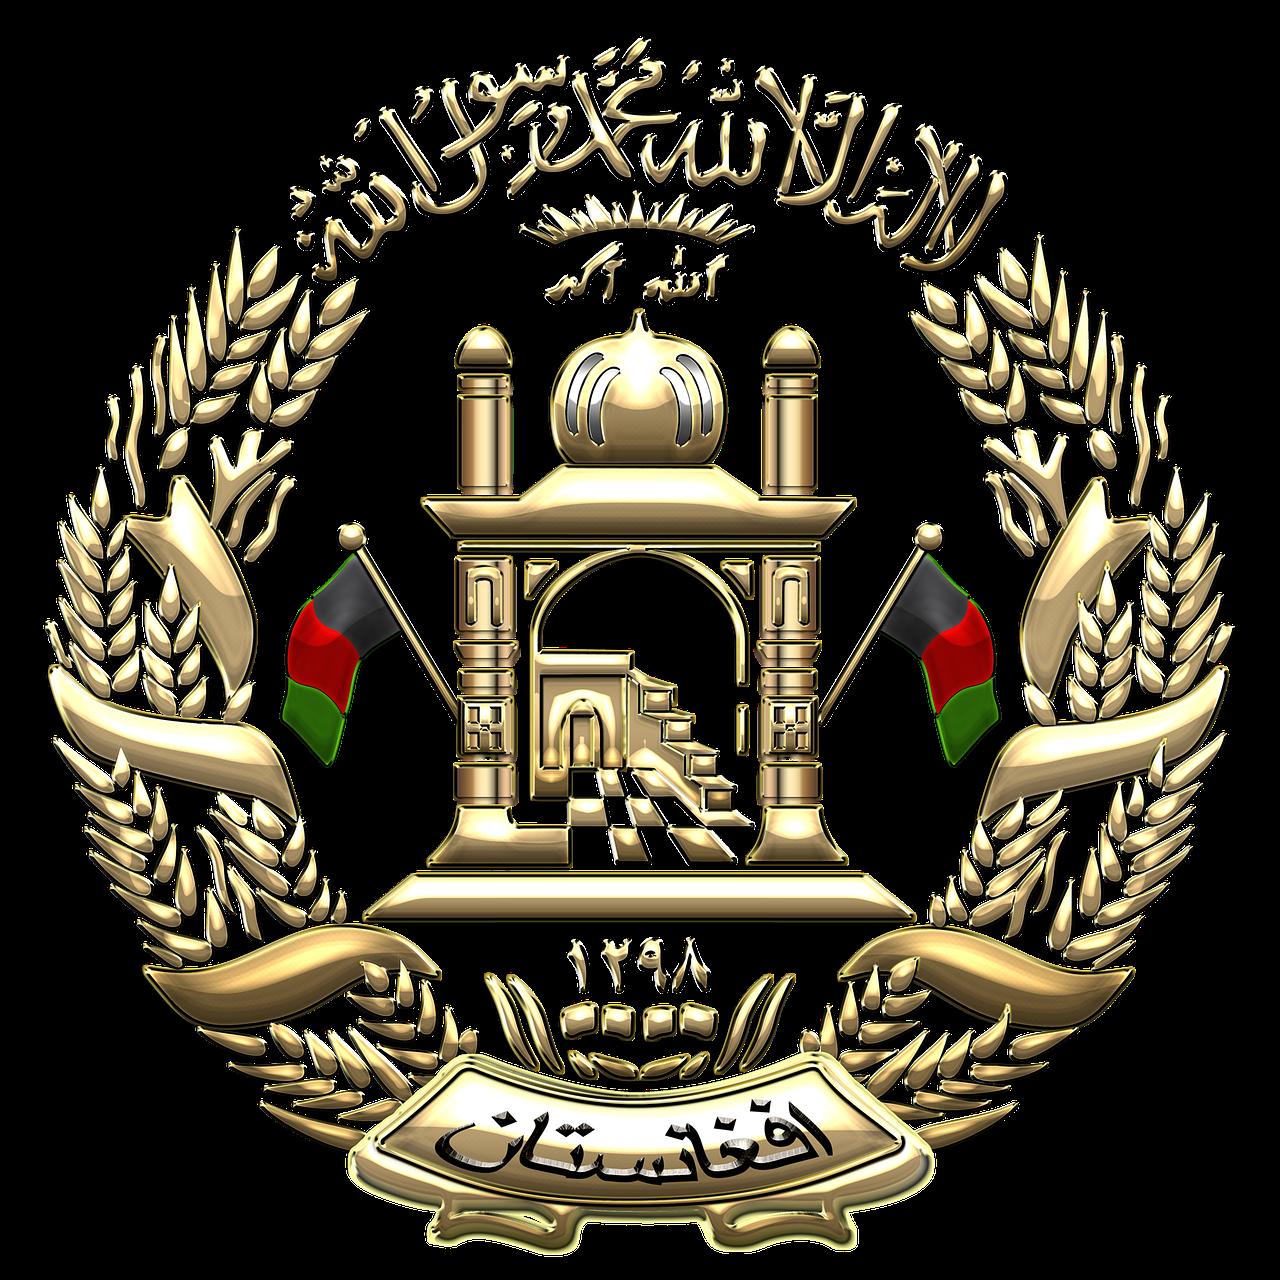 Afghanistan coat of arms (vector). Credit: Serge Averbukh